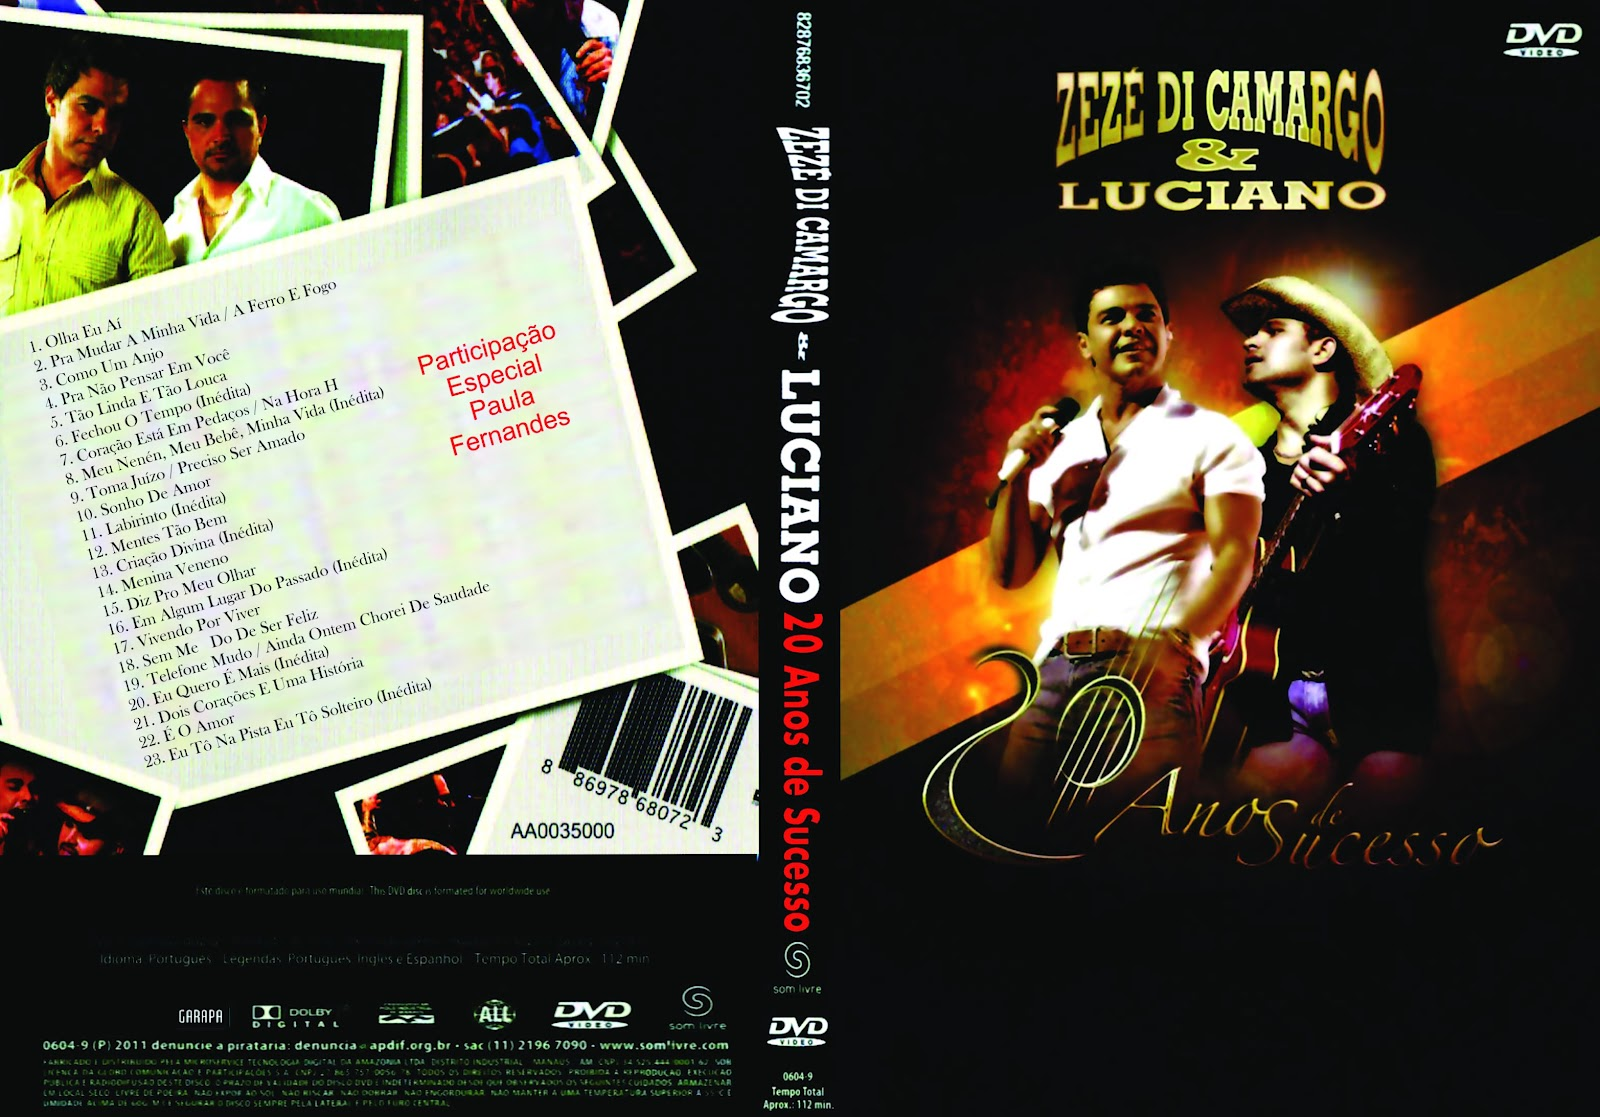 Download discografia zeze di camargo e luciano via torrent | peatix.